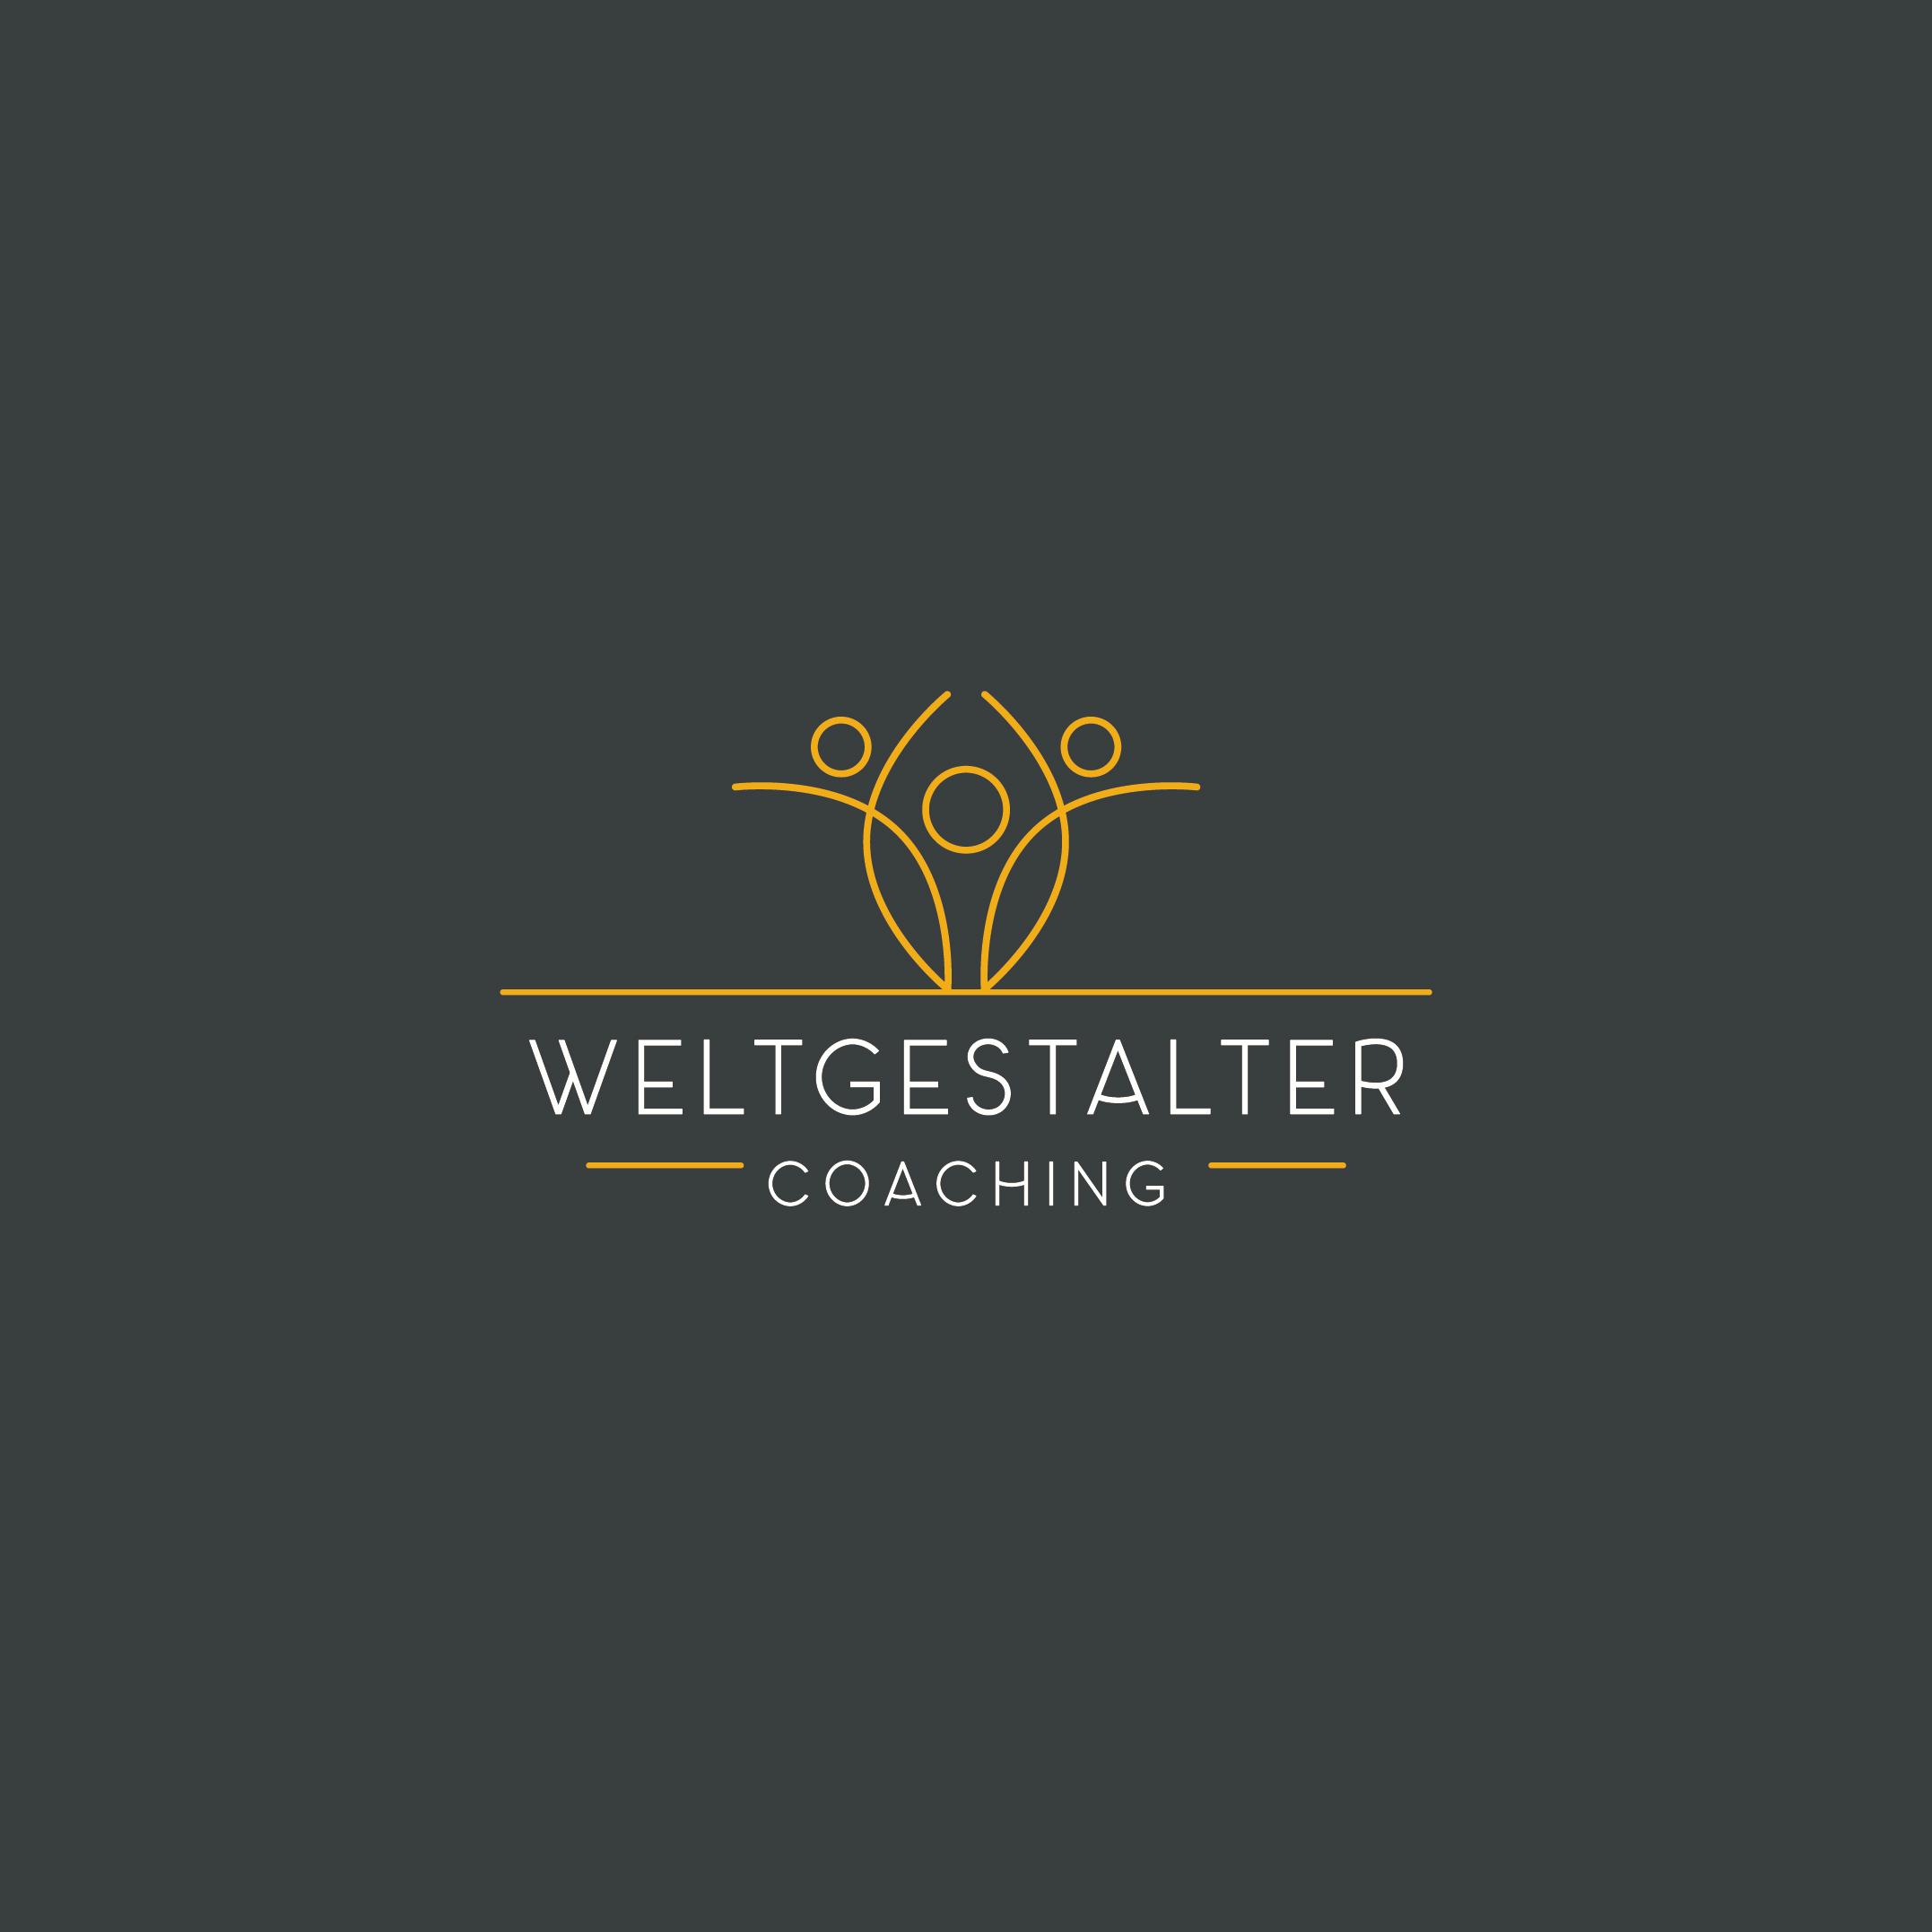 Weltgestalter Coaching